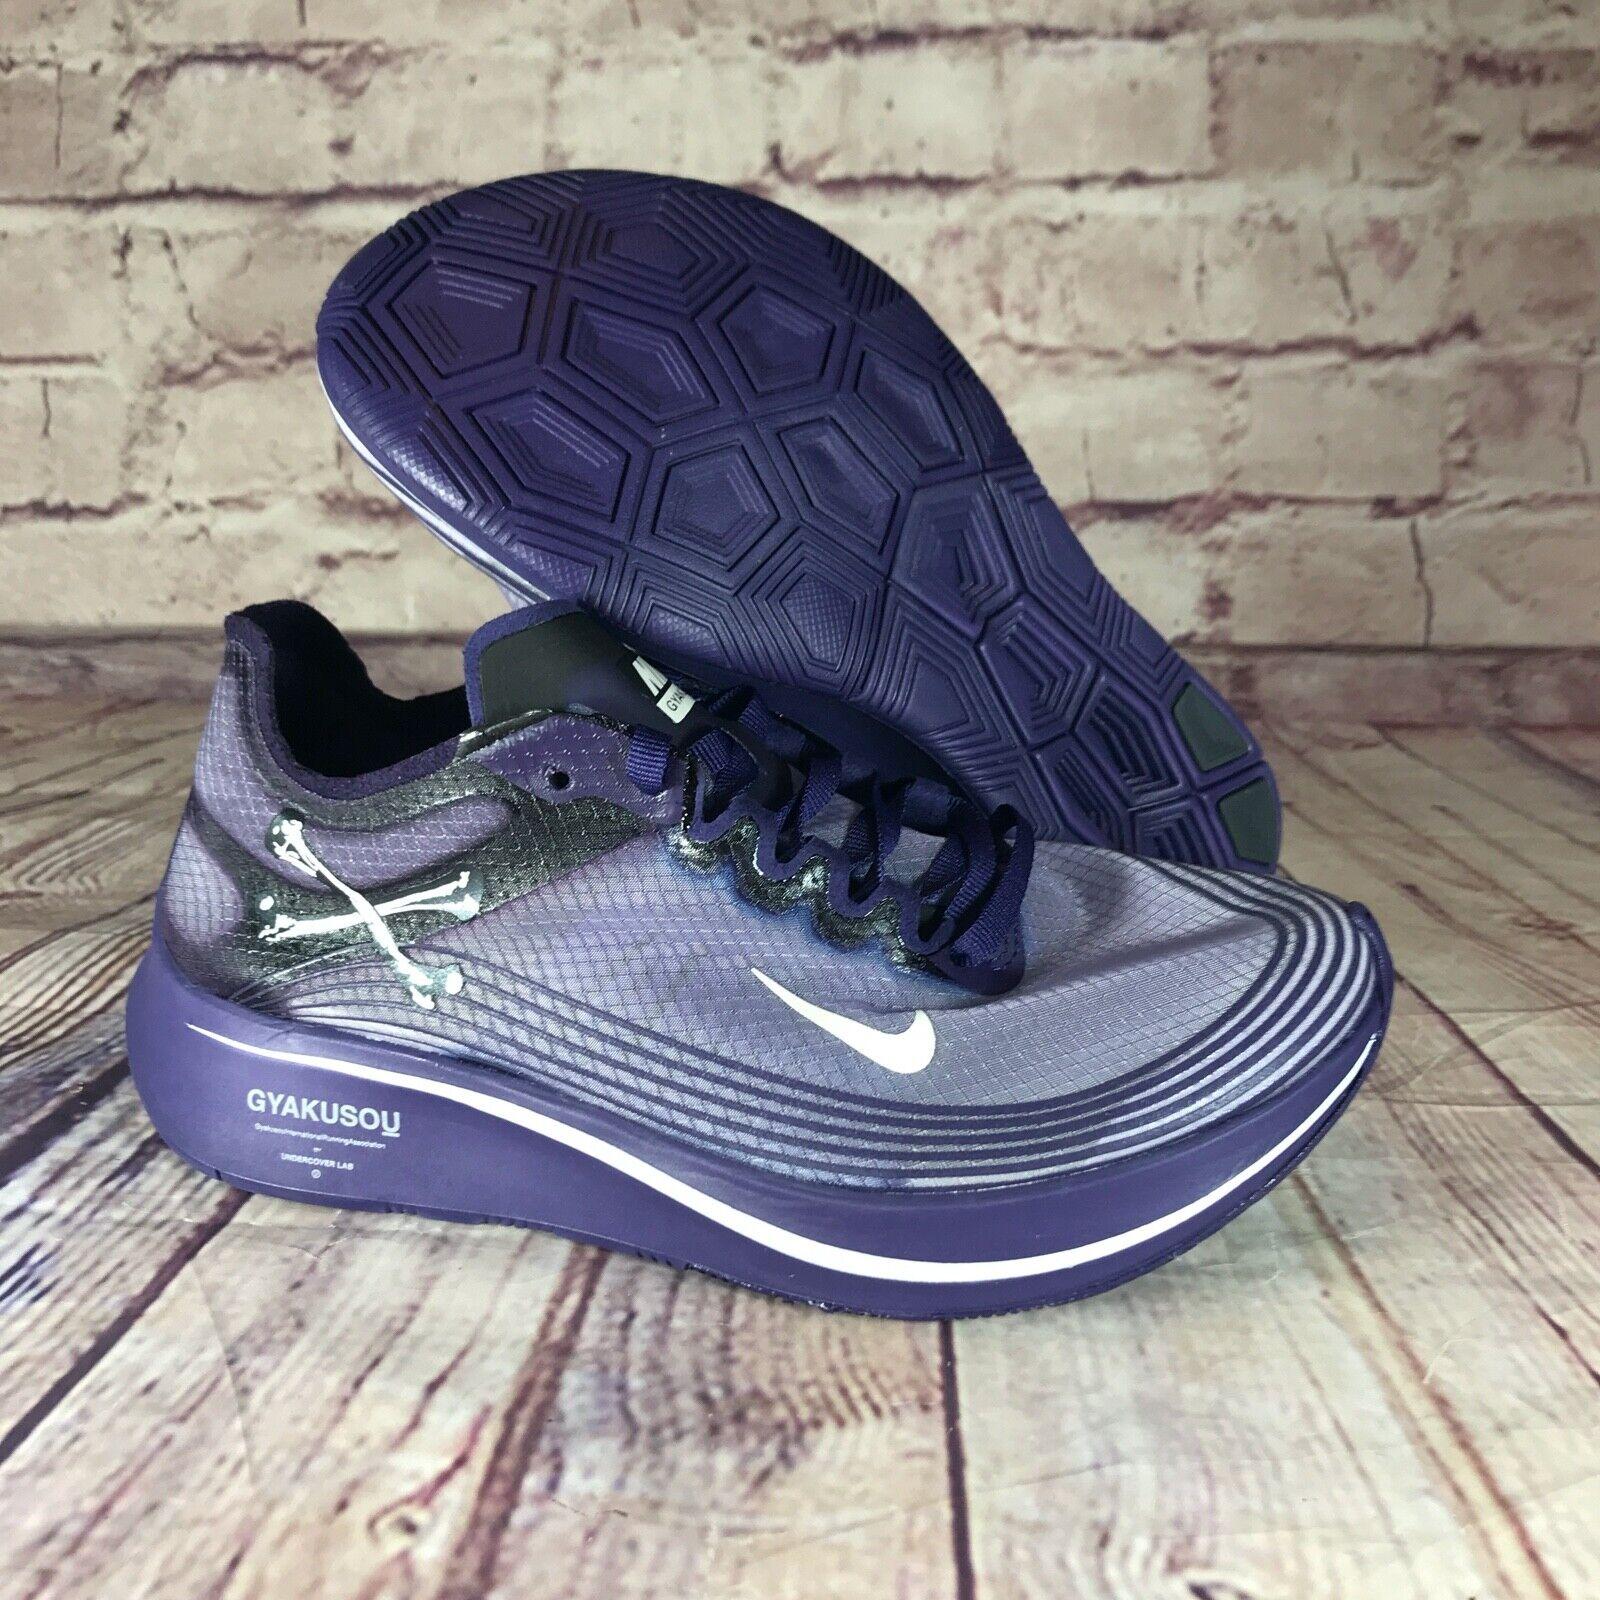 por ciento Clip mariposa George Stevenson  Nike X Zoom Fly SP Gyakusou Undercover Ink 9 Sail Dark Grey Black  Ar4349-500 for sale online   eBay